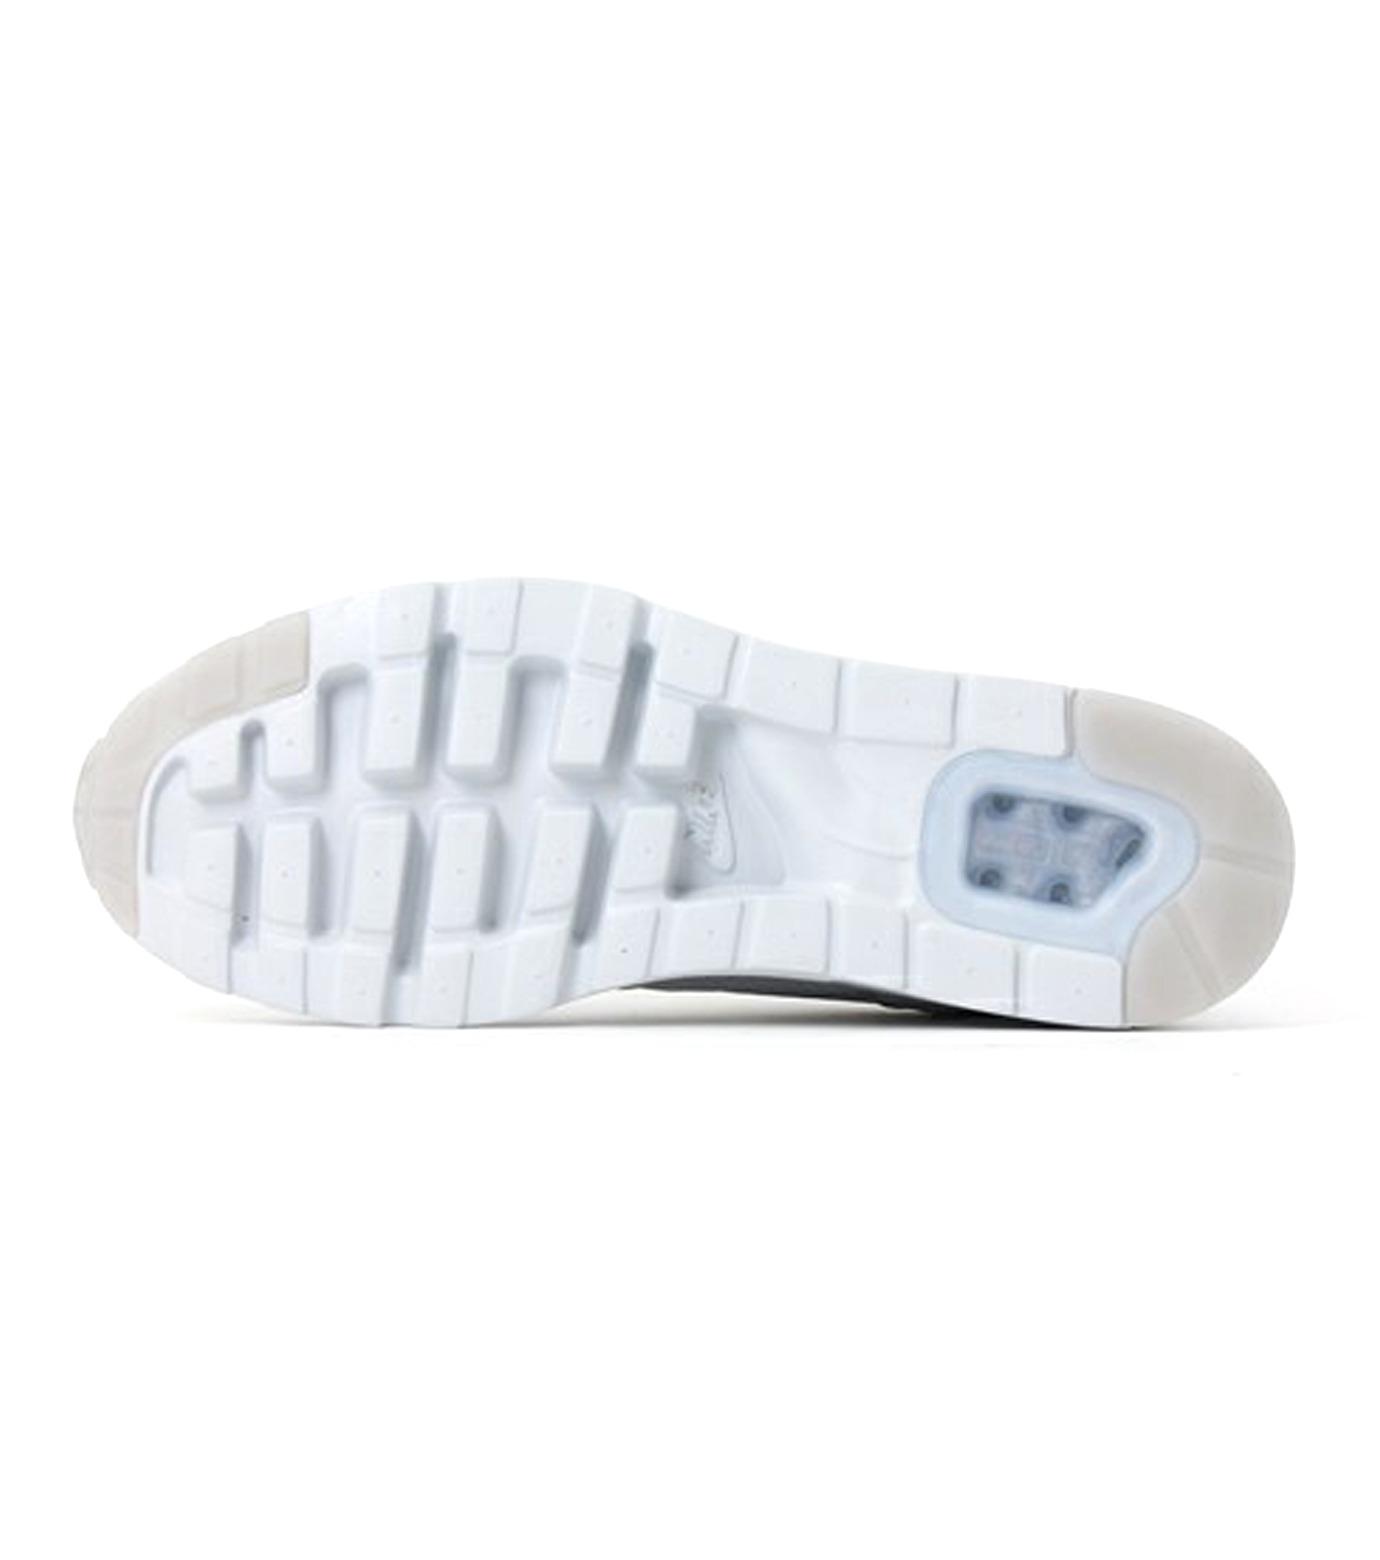 NIKE(ナイキ)のAIR MAX 1 ULTRA MOIRE-GRAY(シューズ/shoes)-705297-020-11 拡大詳細画像2